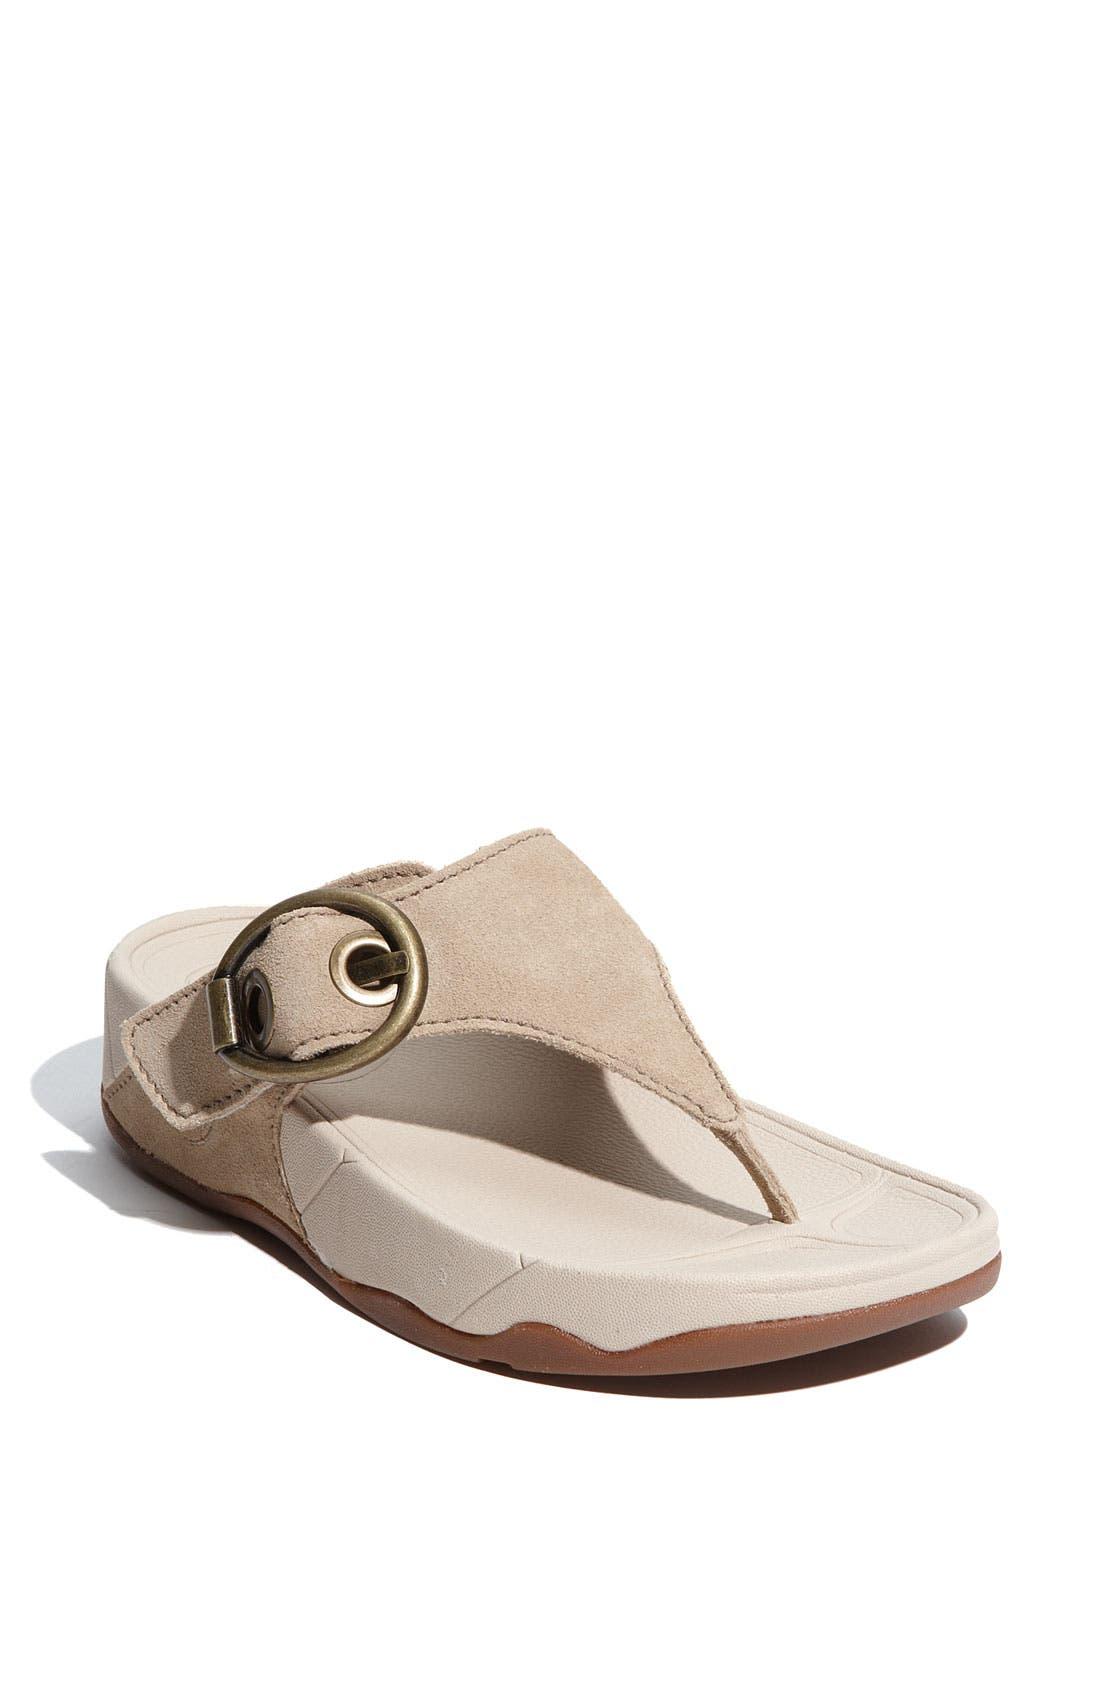 Alternate Image 1 Selected - FitFlop 'Hooper' Sandal